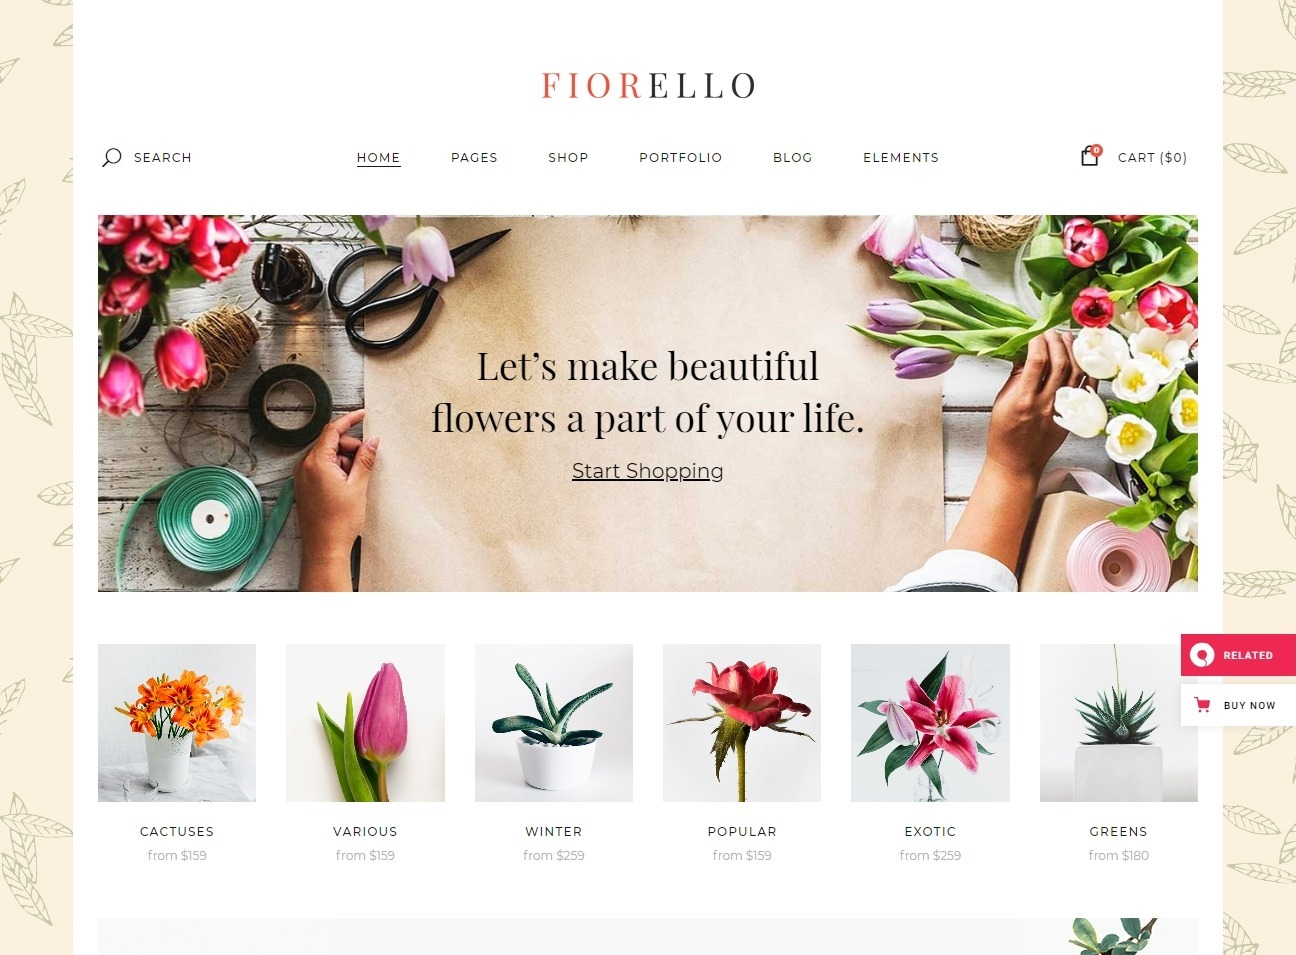 Fiorello Florist and Flower Shop Theme